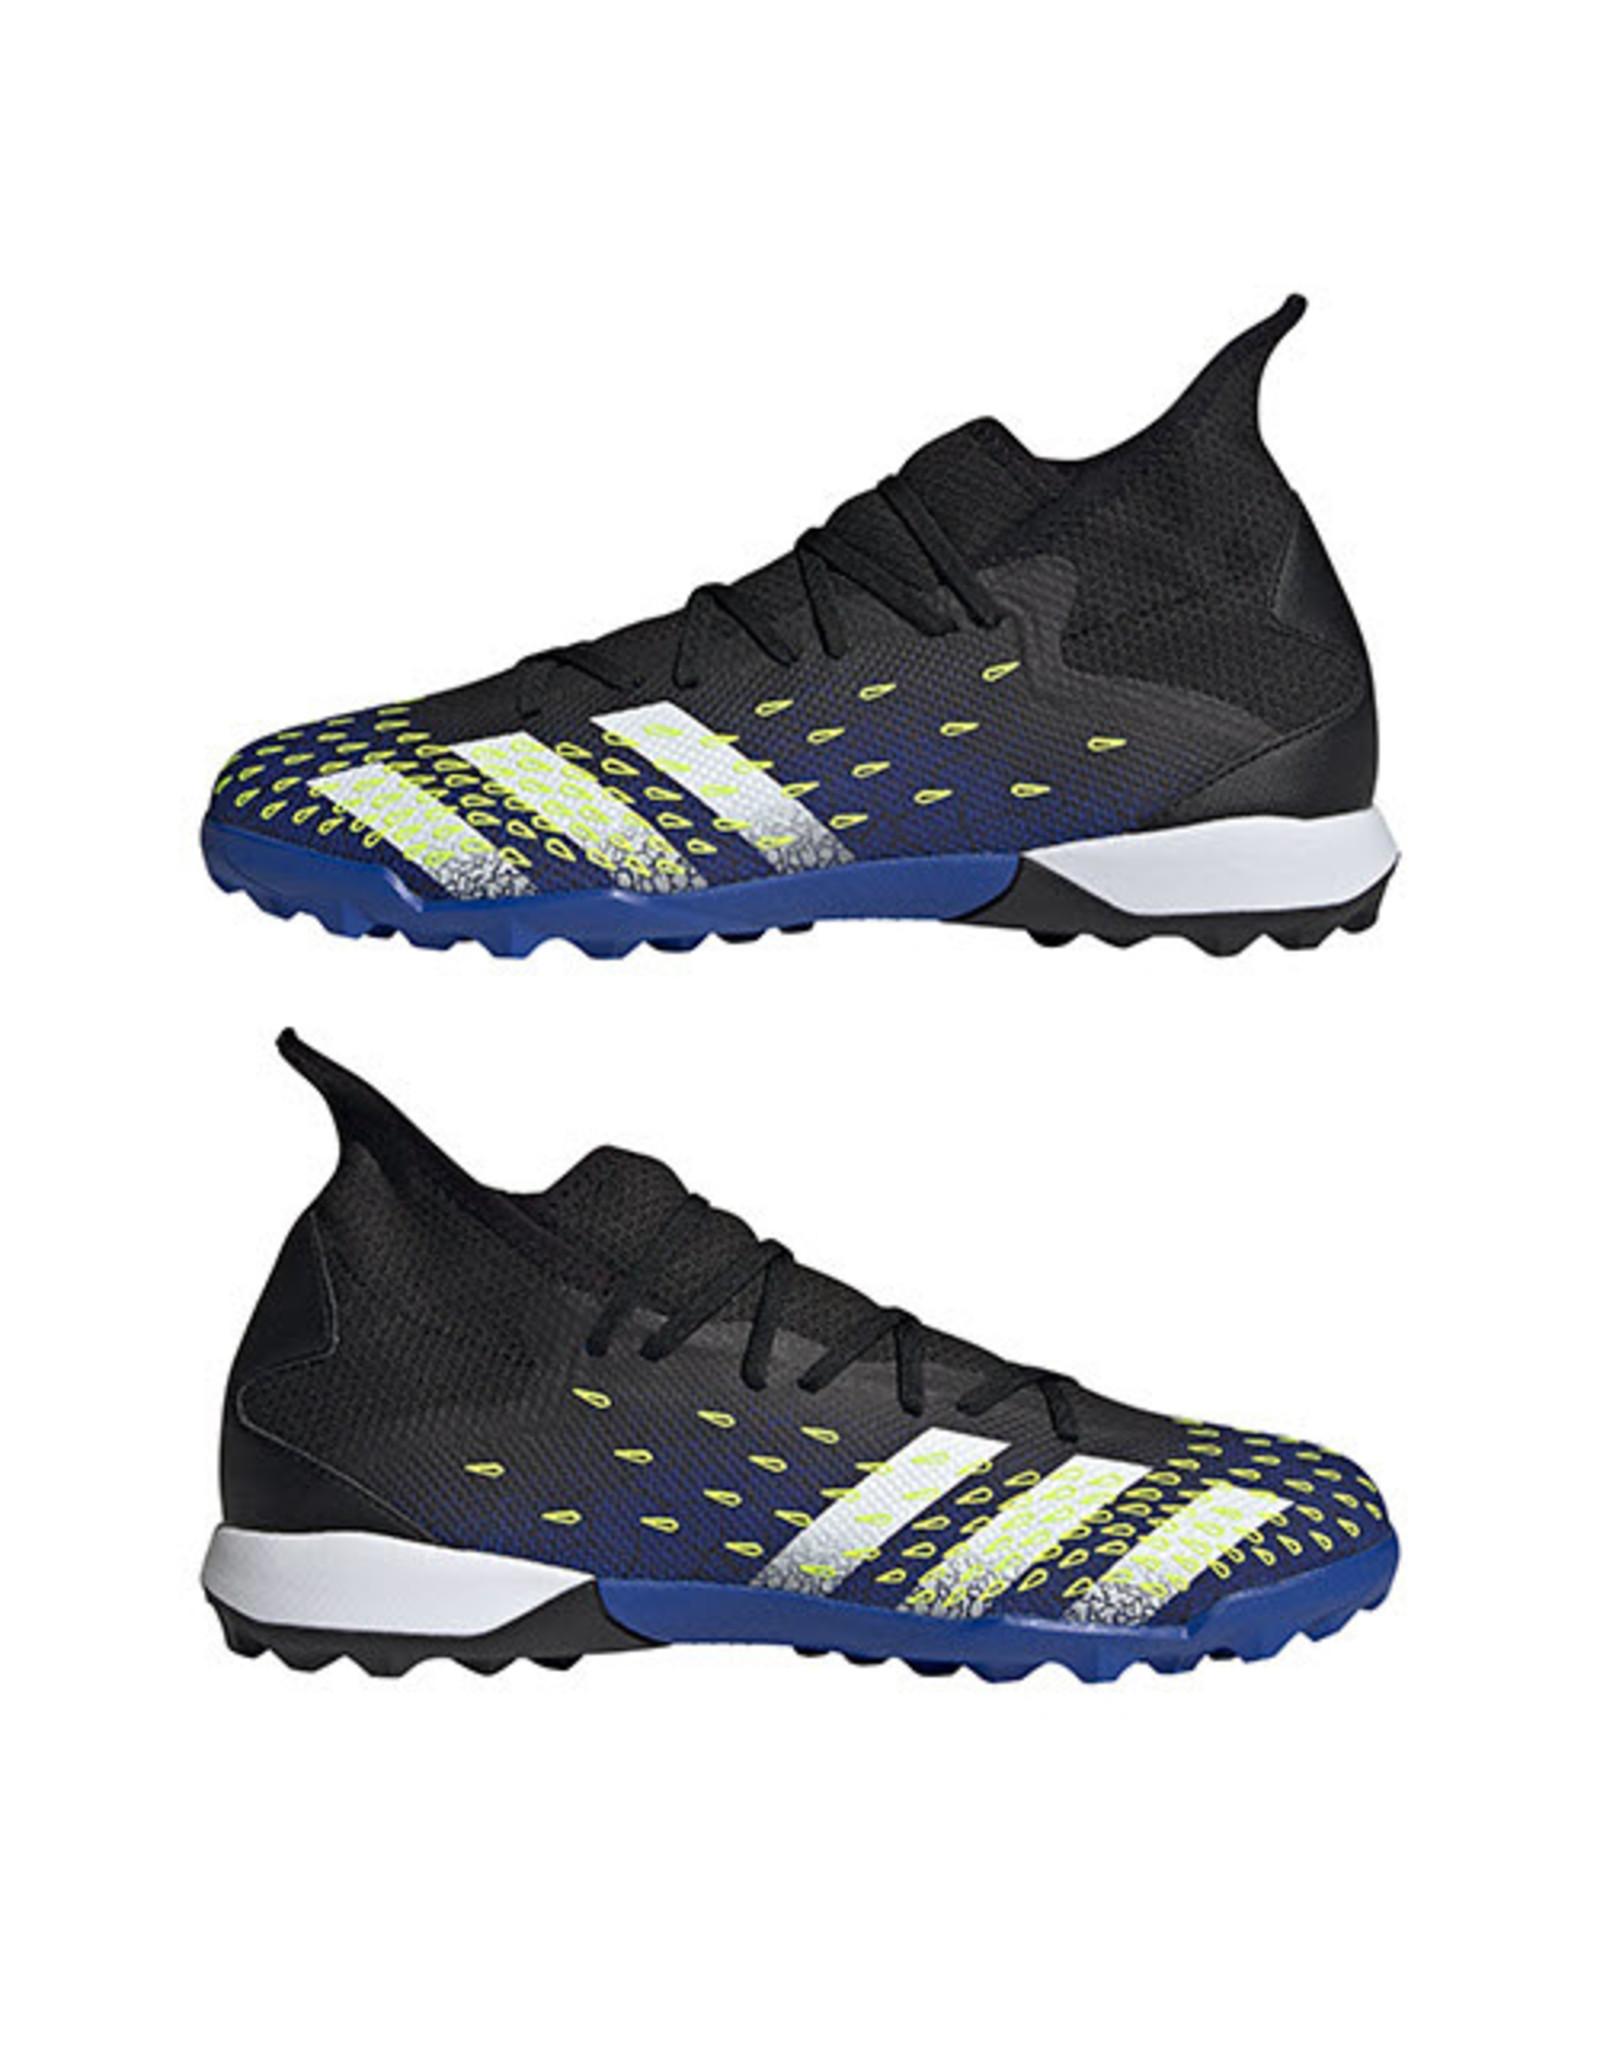 Adidas ADI PREDATOR FREAK .3 TF (CBLACK/FTWWHT/SYELLO)